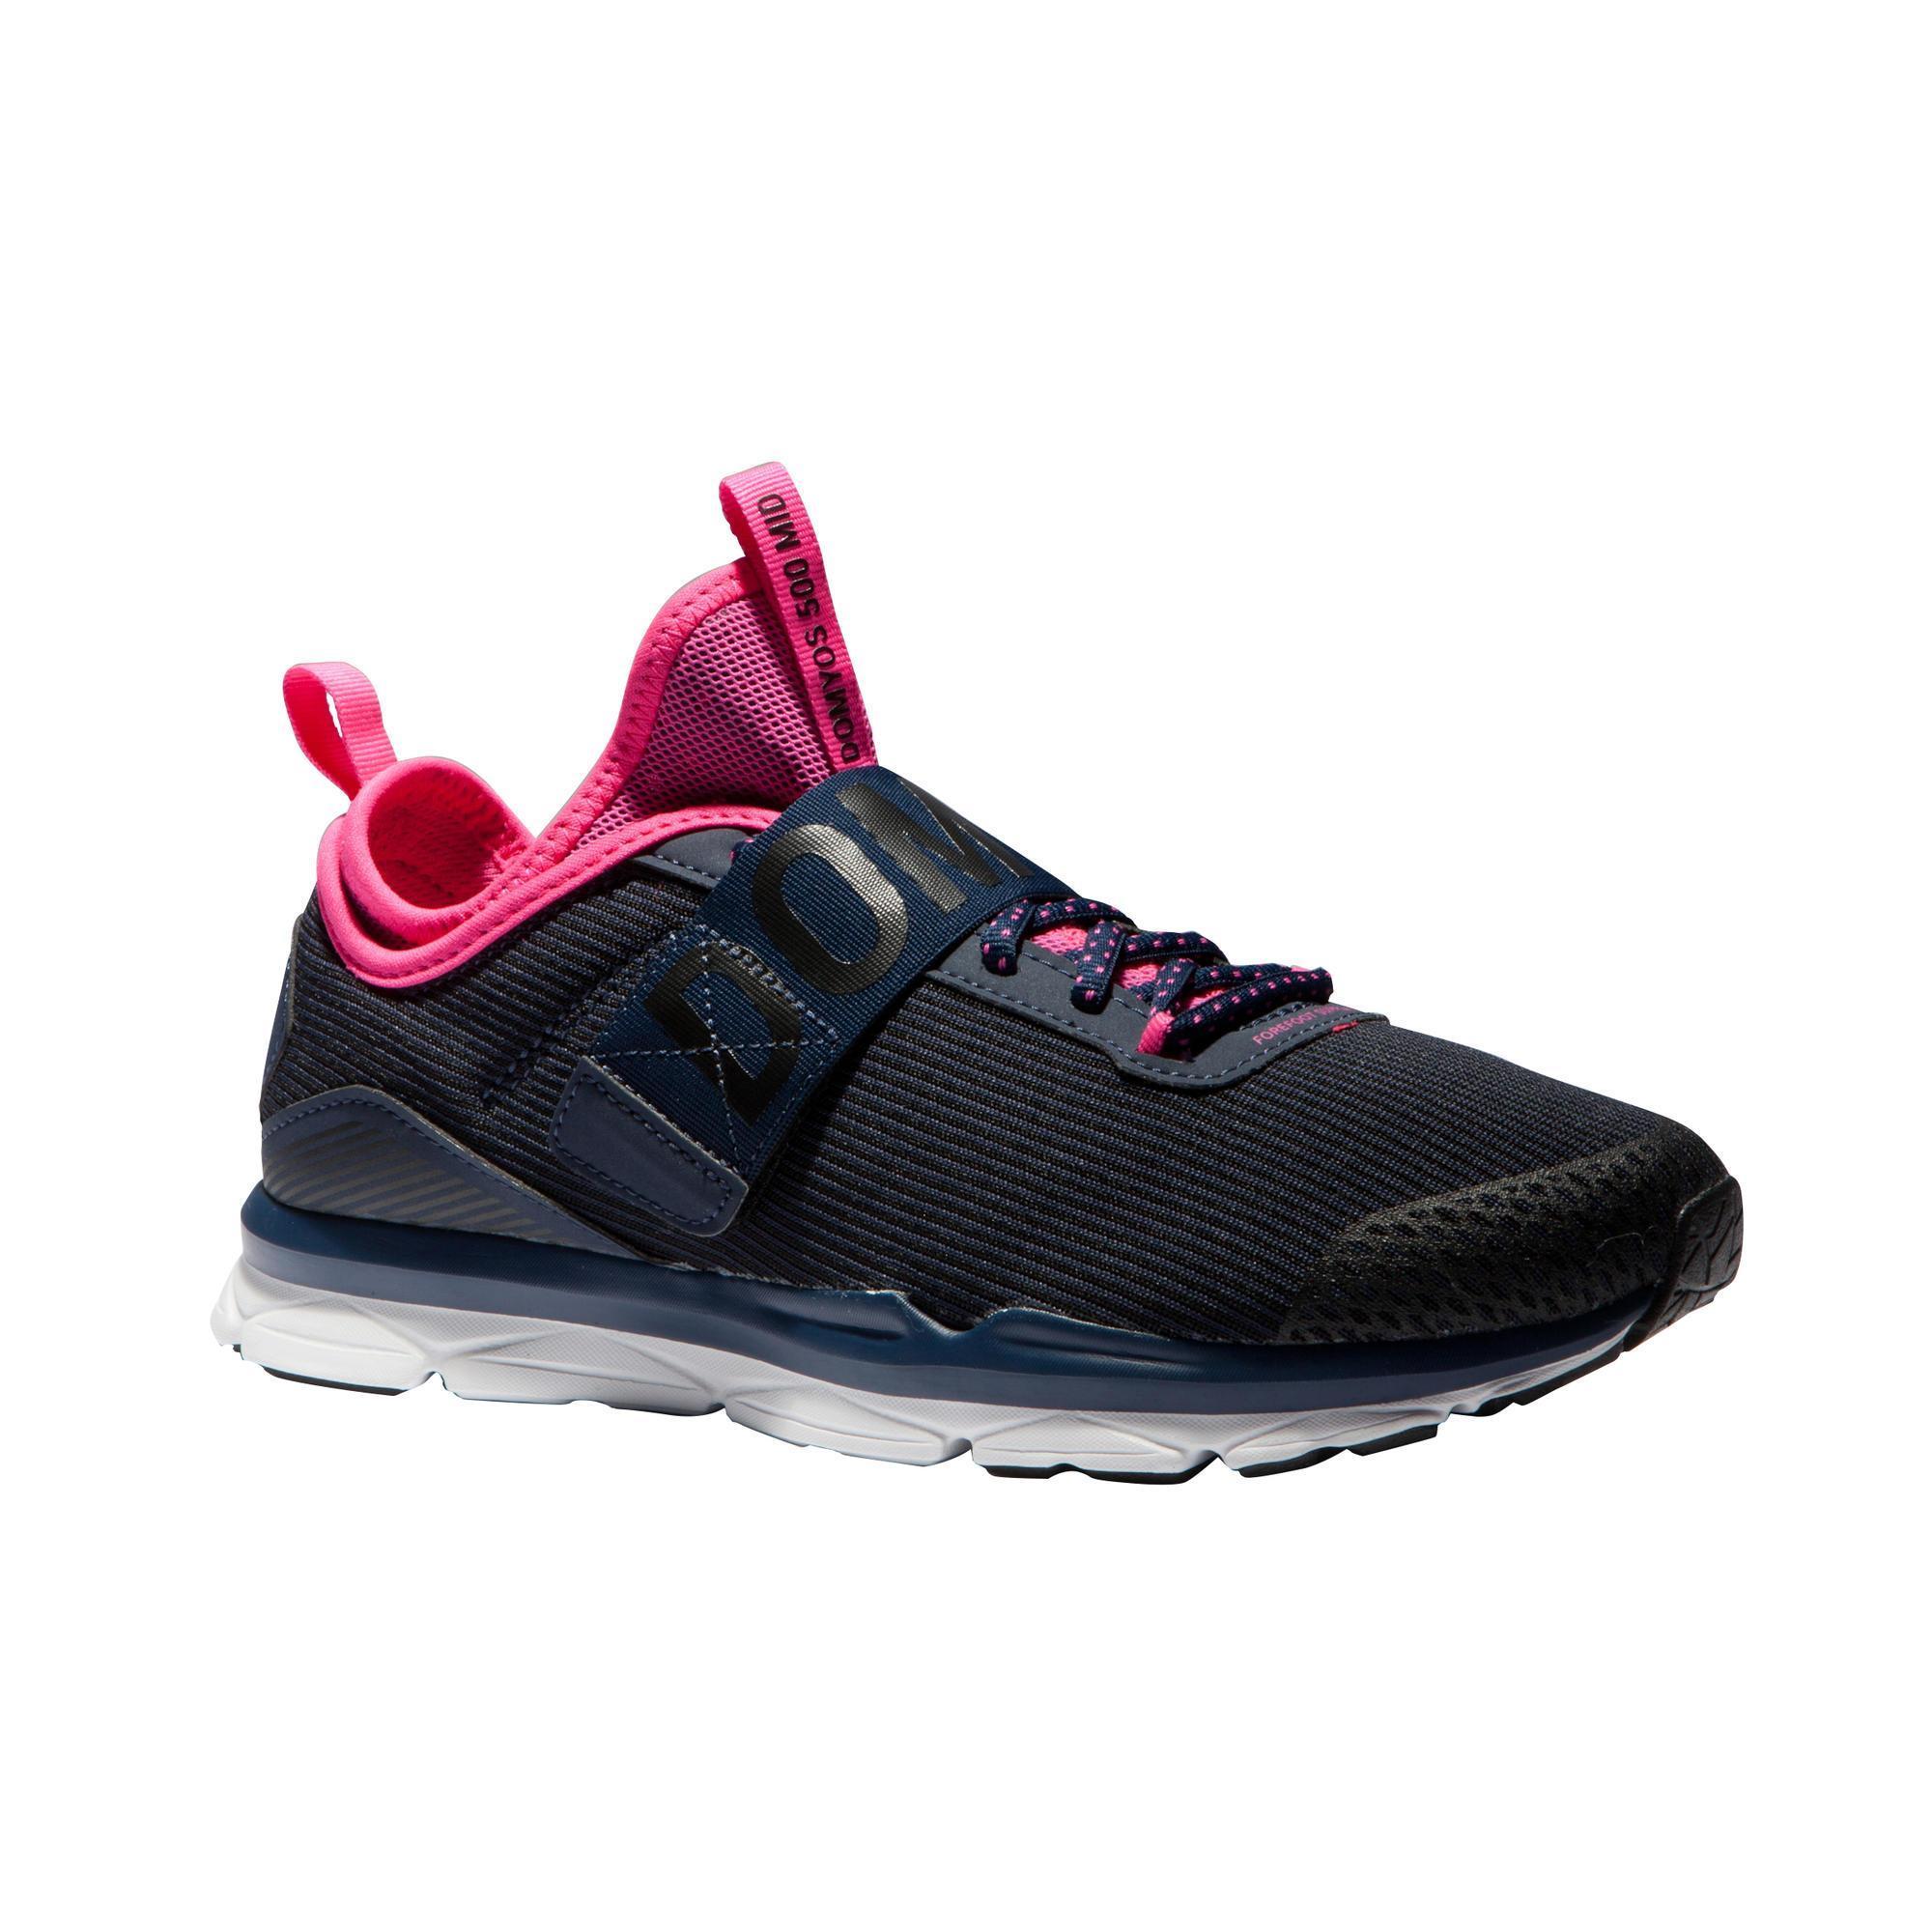 Zapatillas fitness cardio-training 500 mid mujer azul y rosa Domyos ... 971bb751299